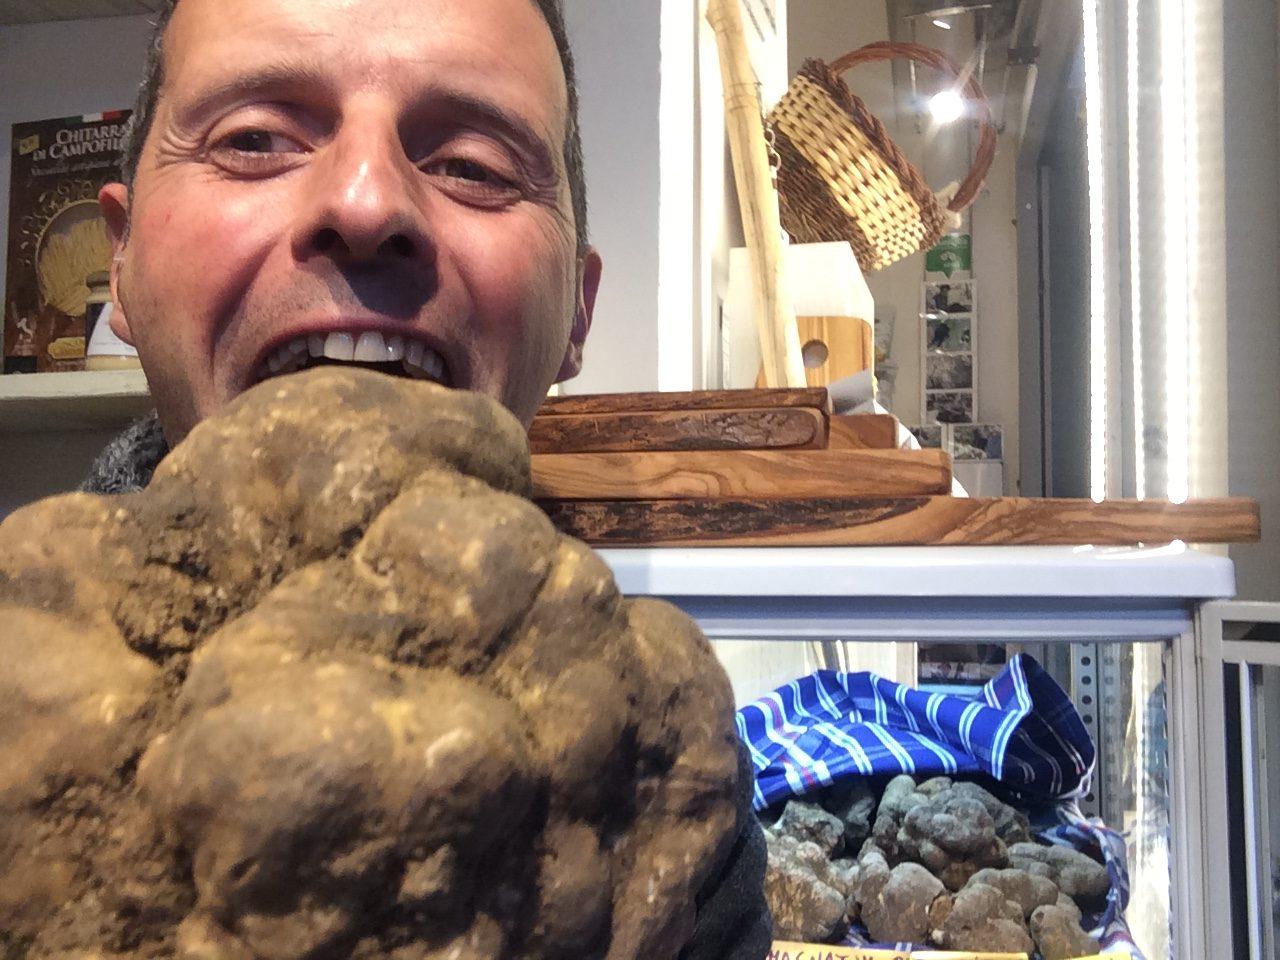 Alessandro di Siena Tartufi scherza dopo aver trovato un bellissimo tartufo bianco - truffle hunting Siena Toscana